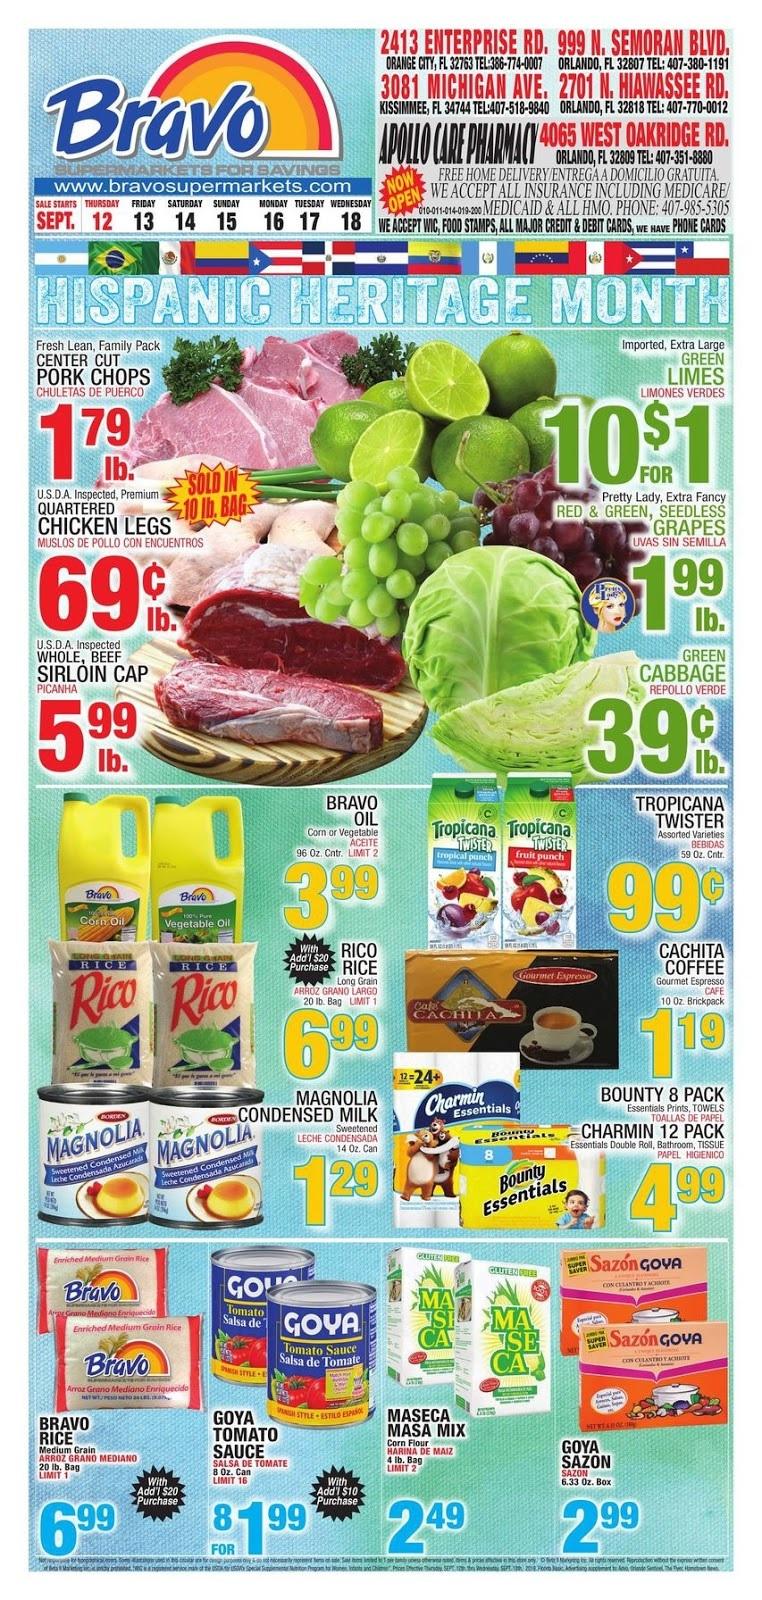 ⭐ Bravo Supermarkets Circular 9/19/19